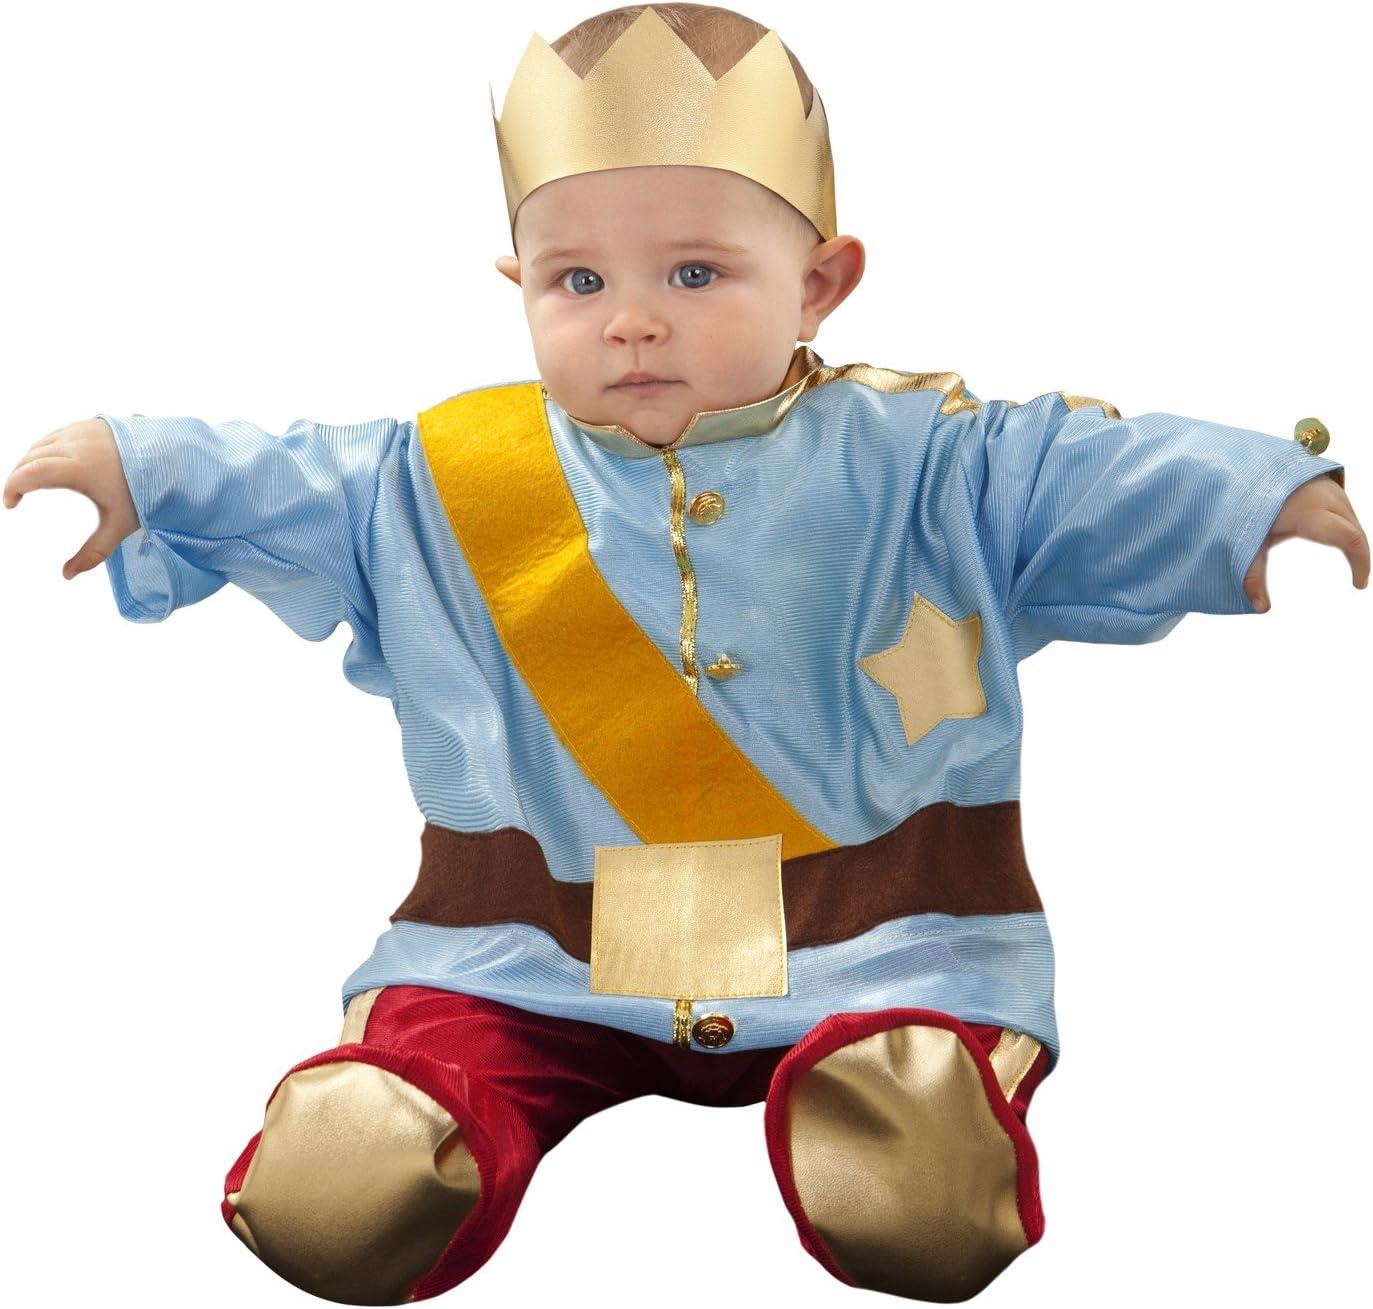 Boys Toys - Disfraz principito bebé. talla 6-12 meses: Amazon.es ...